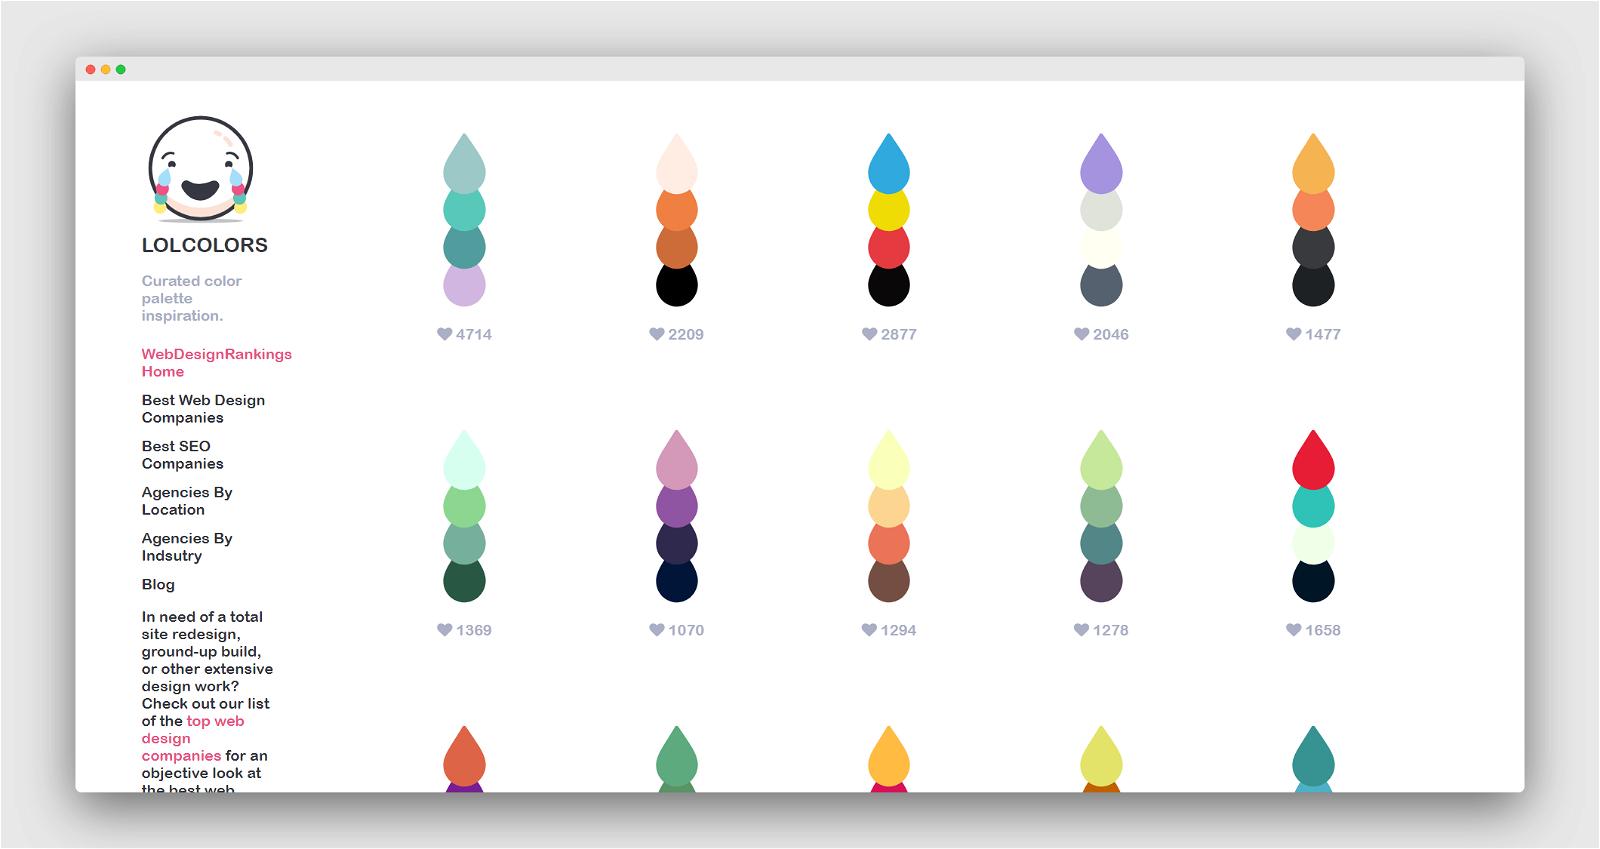 Lol Colors Screenshot 1